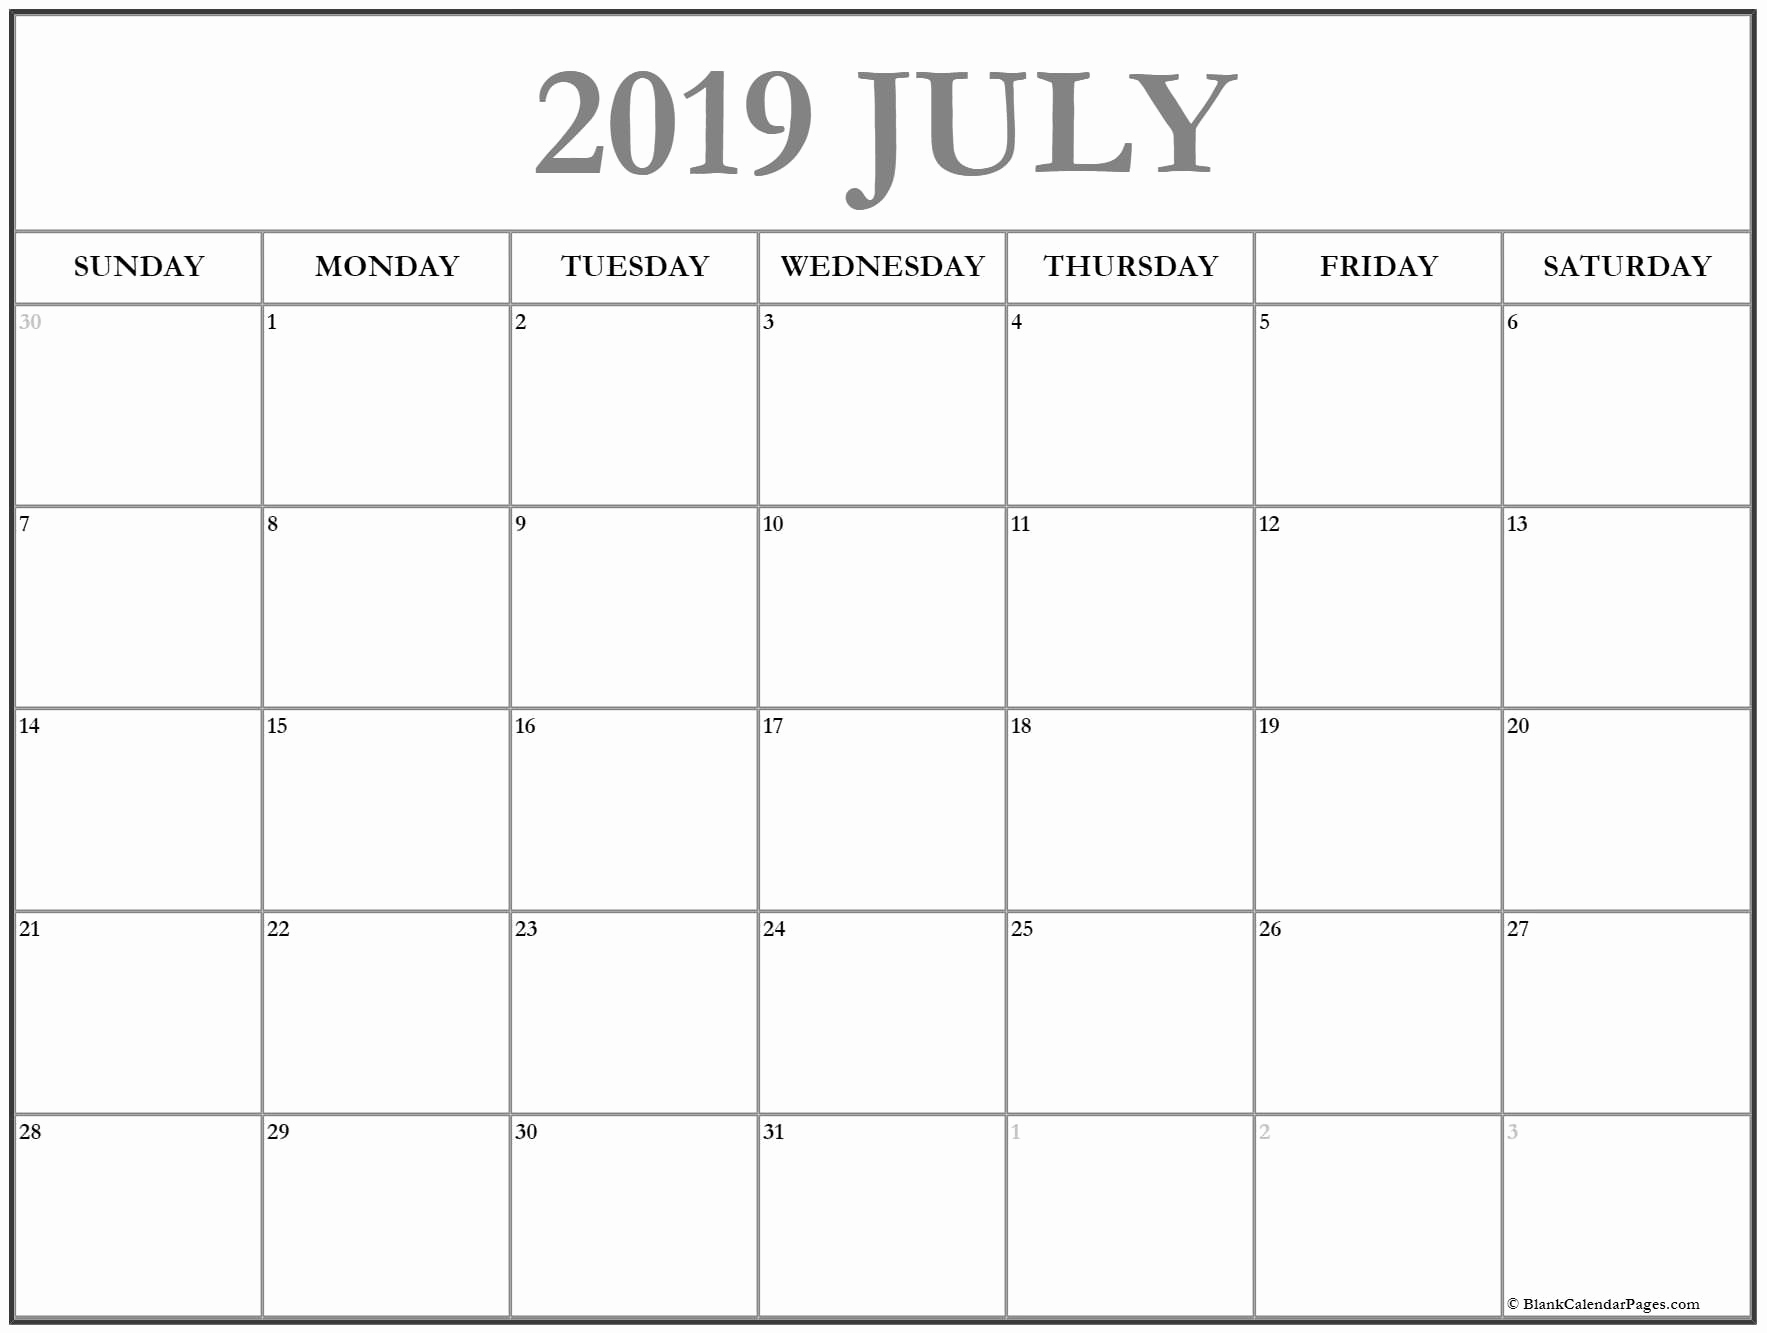 July 2019 Printable Calendar Pdf - Free Printable Calendar throughout Caleners From July 2019 -December 2020 Free Printable